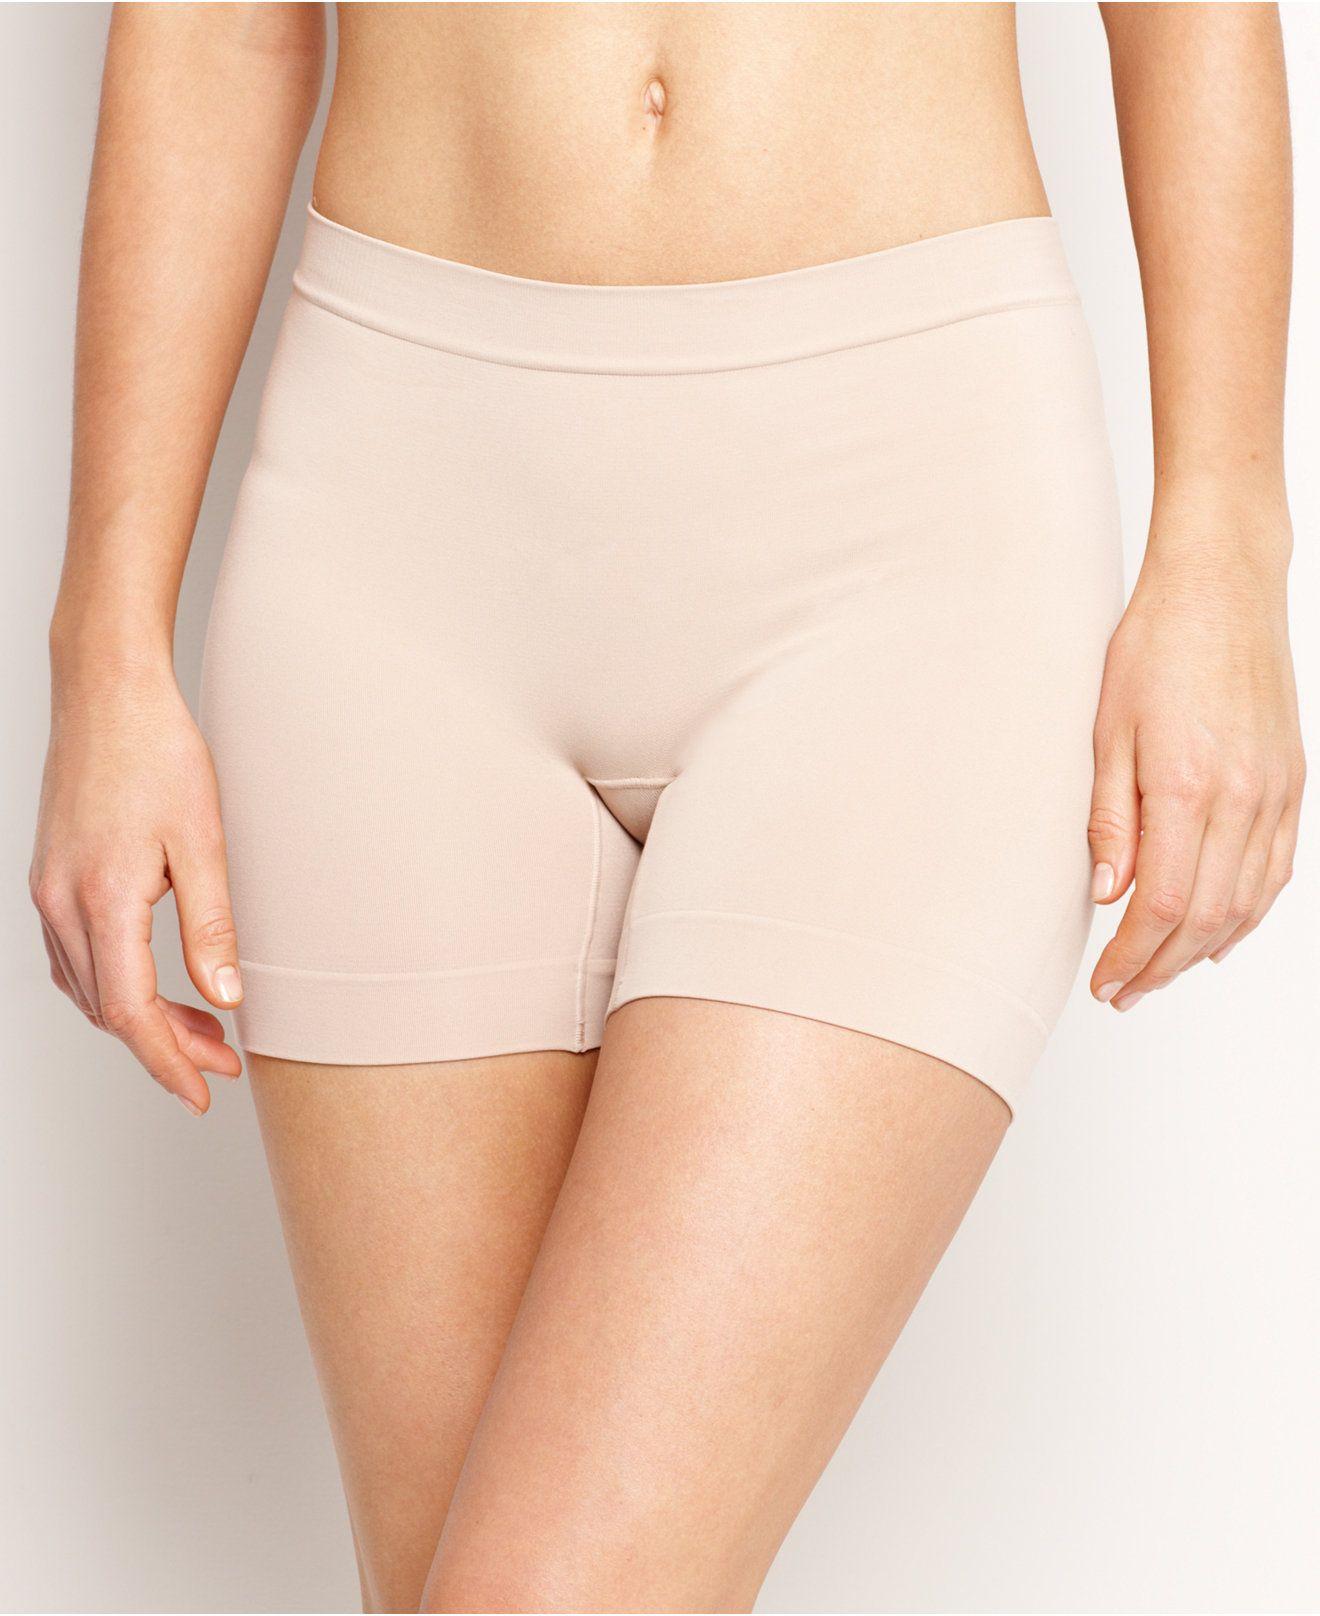 6757f4591a6 Jockey Skimmies Short Length Slip Shorts 2108 - Bras